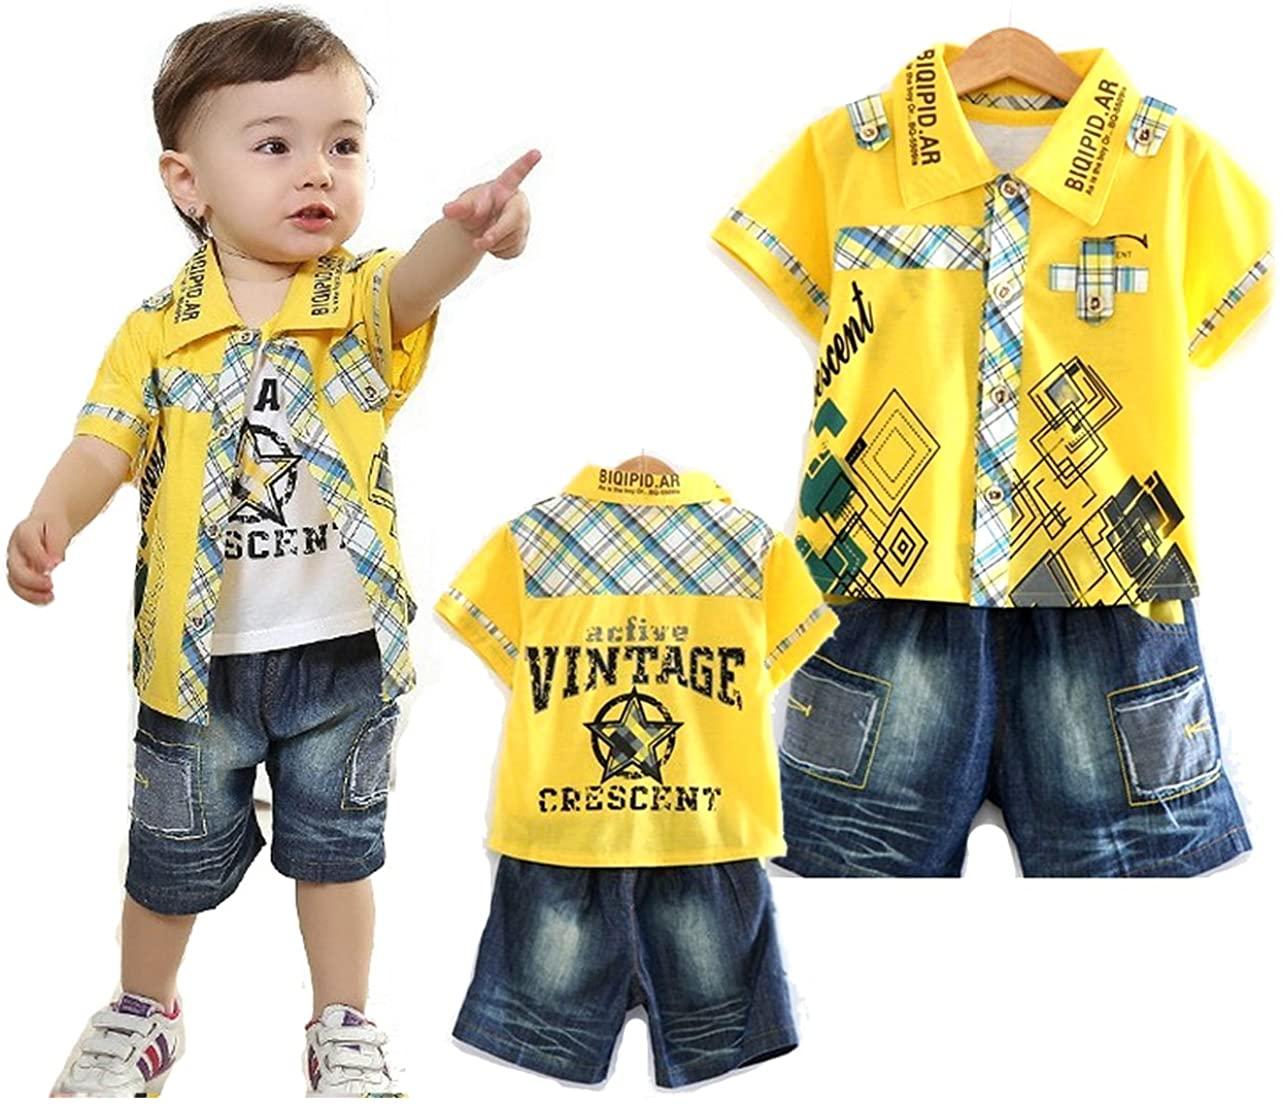 SOPO Baby Boy 3 Piece Outfits (Summer Shirt, Vest, Denim Shorts) Yellow 9-24m